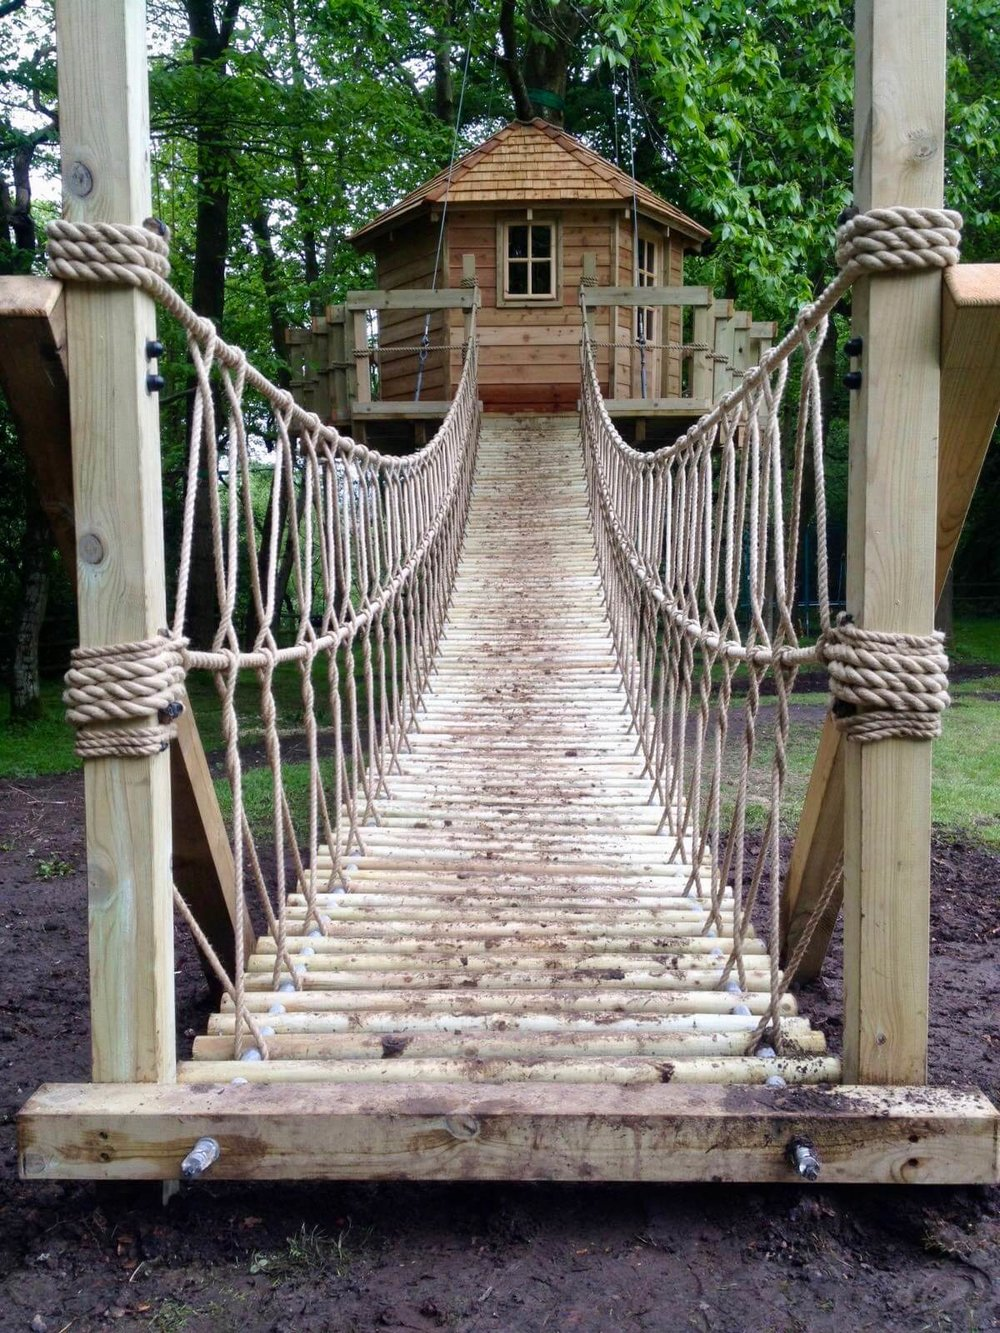 Garden Log Rope Bridge — Rope Bridge projects - UK and Worldwide on tree house boat design, tree shaped bookshelf, japanese garden bridge design, tree fort rope bridge,